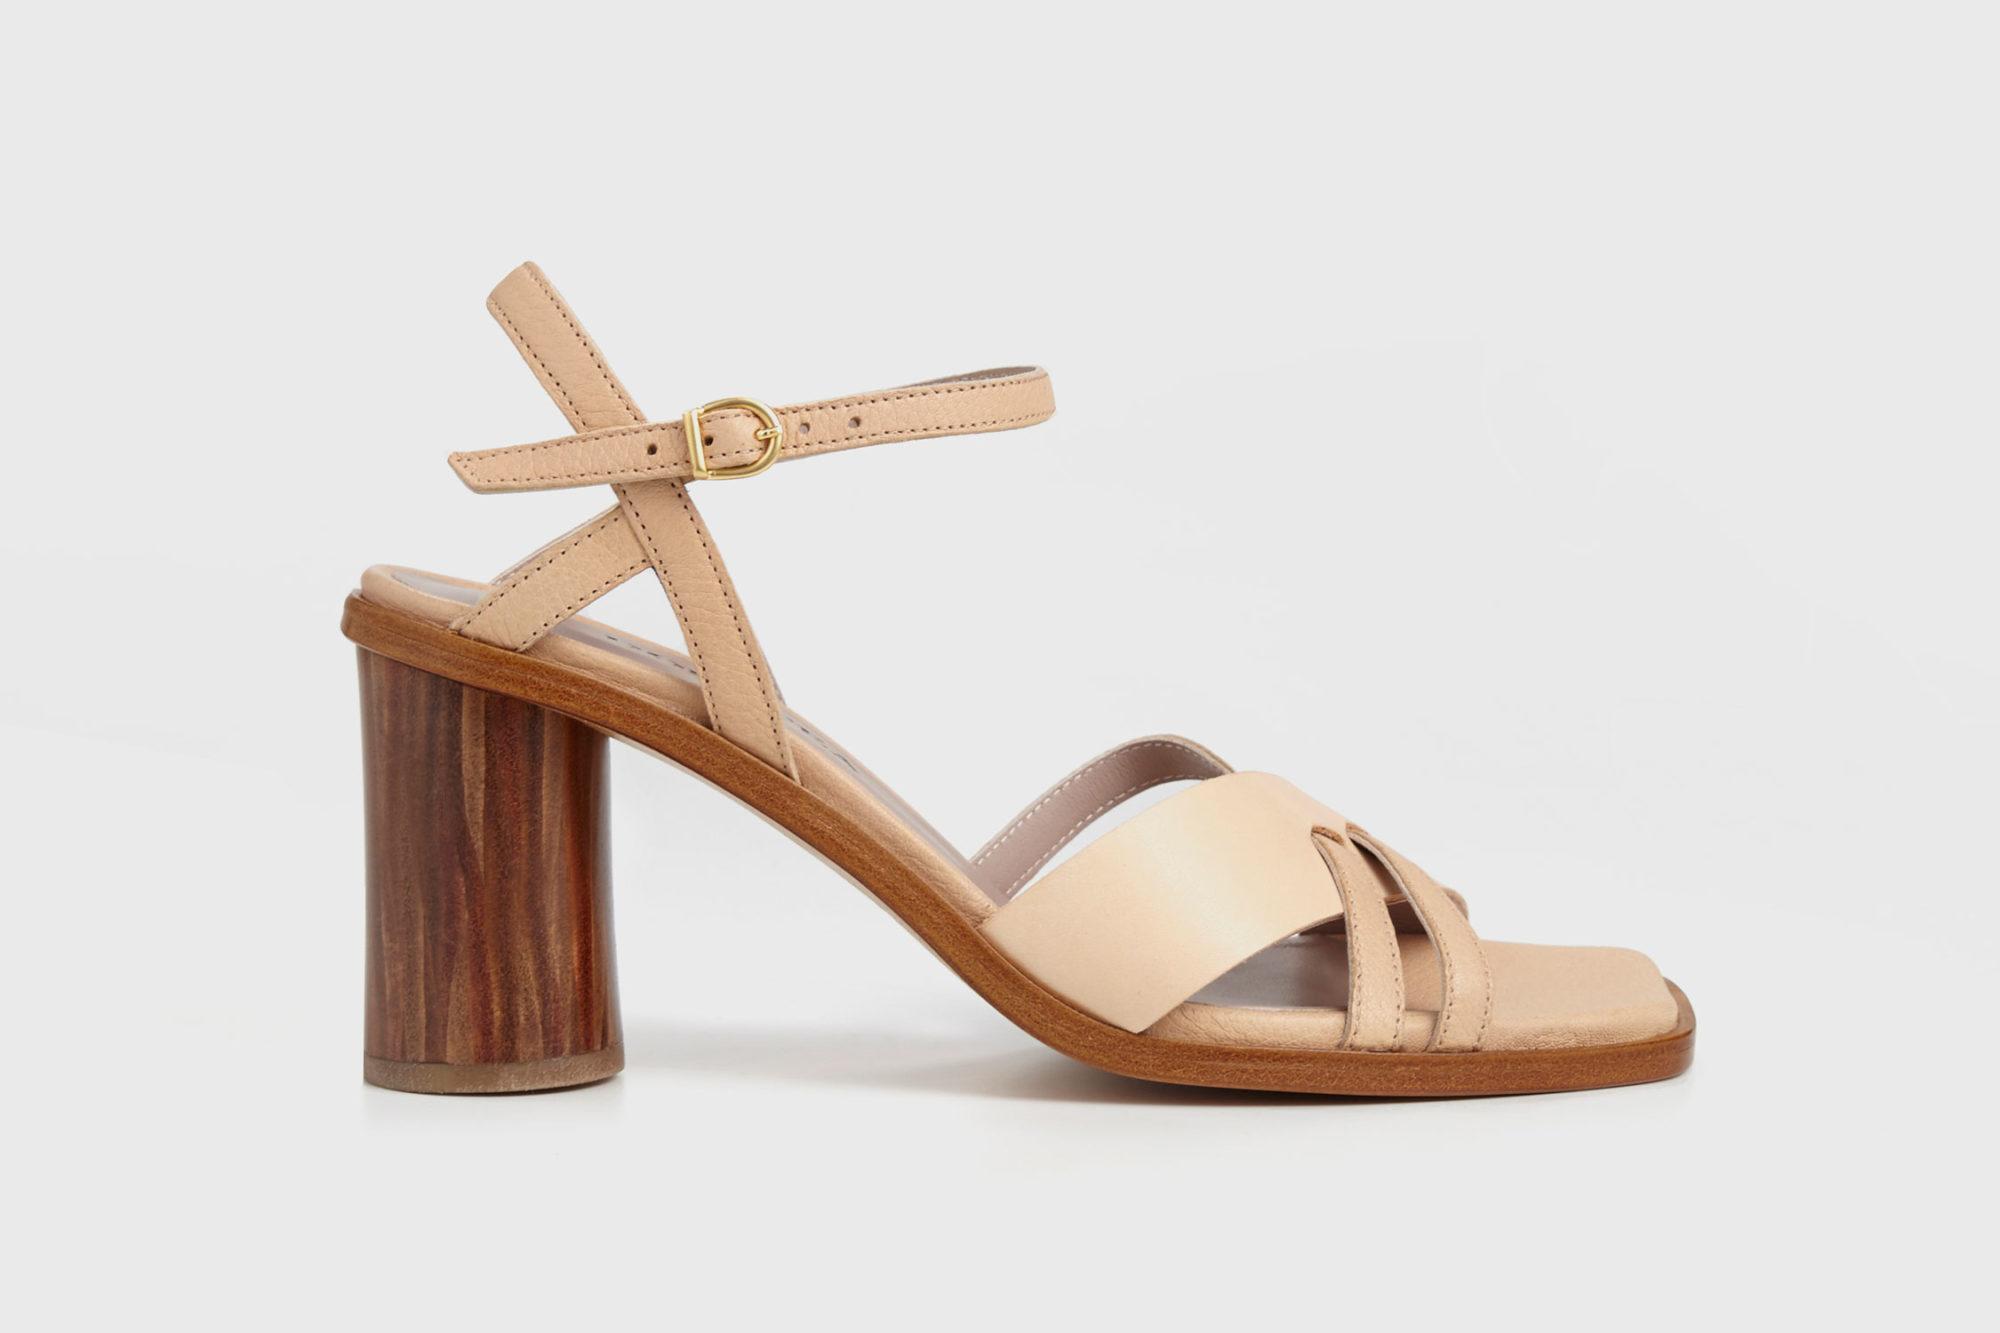 Dorotea sandalia de tacón alto Sophie nude ss17 perfil